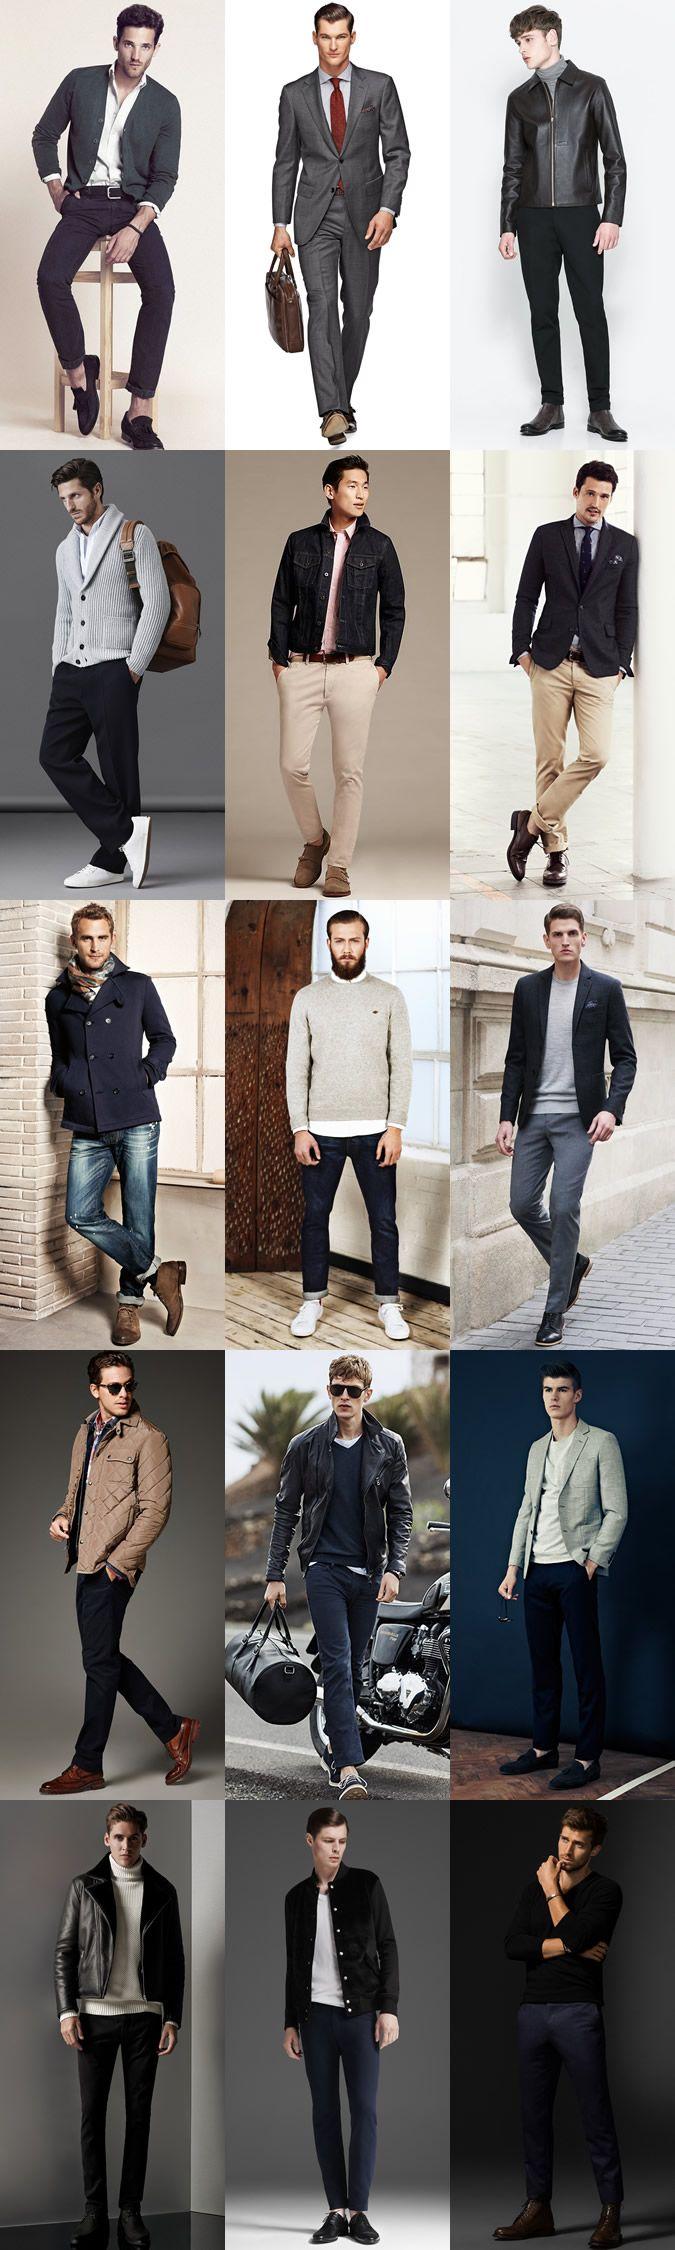 Men's Capsule Wardrobe Outfit Inspiration Lookbook